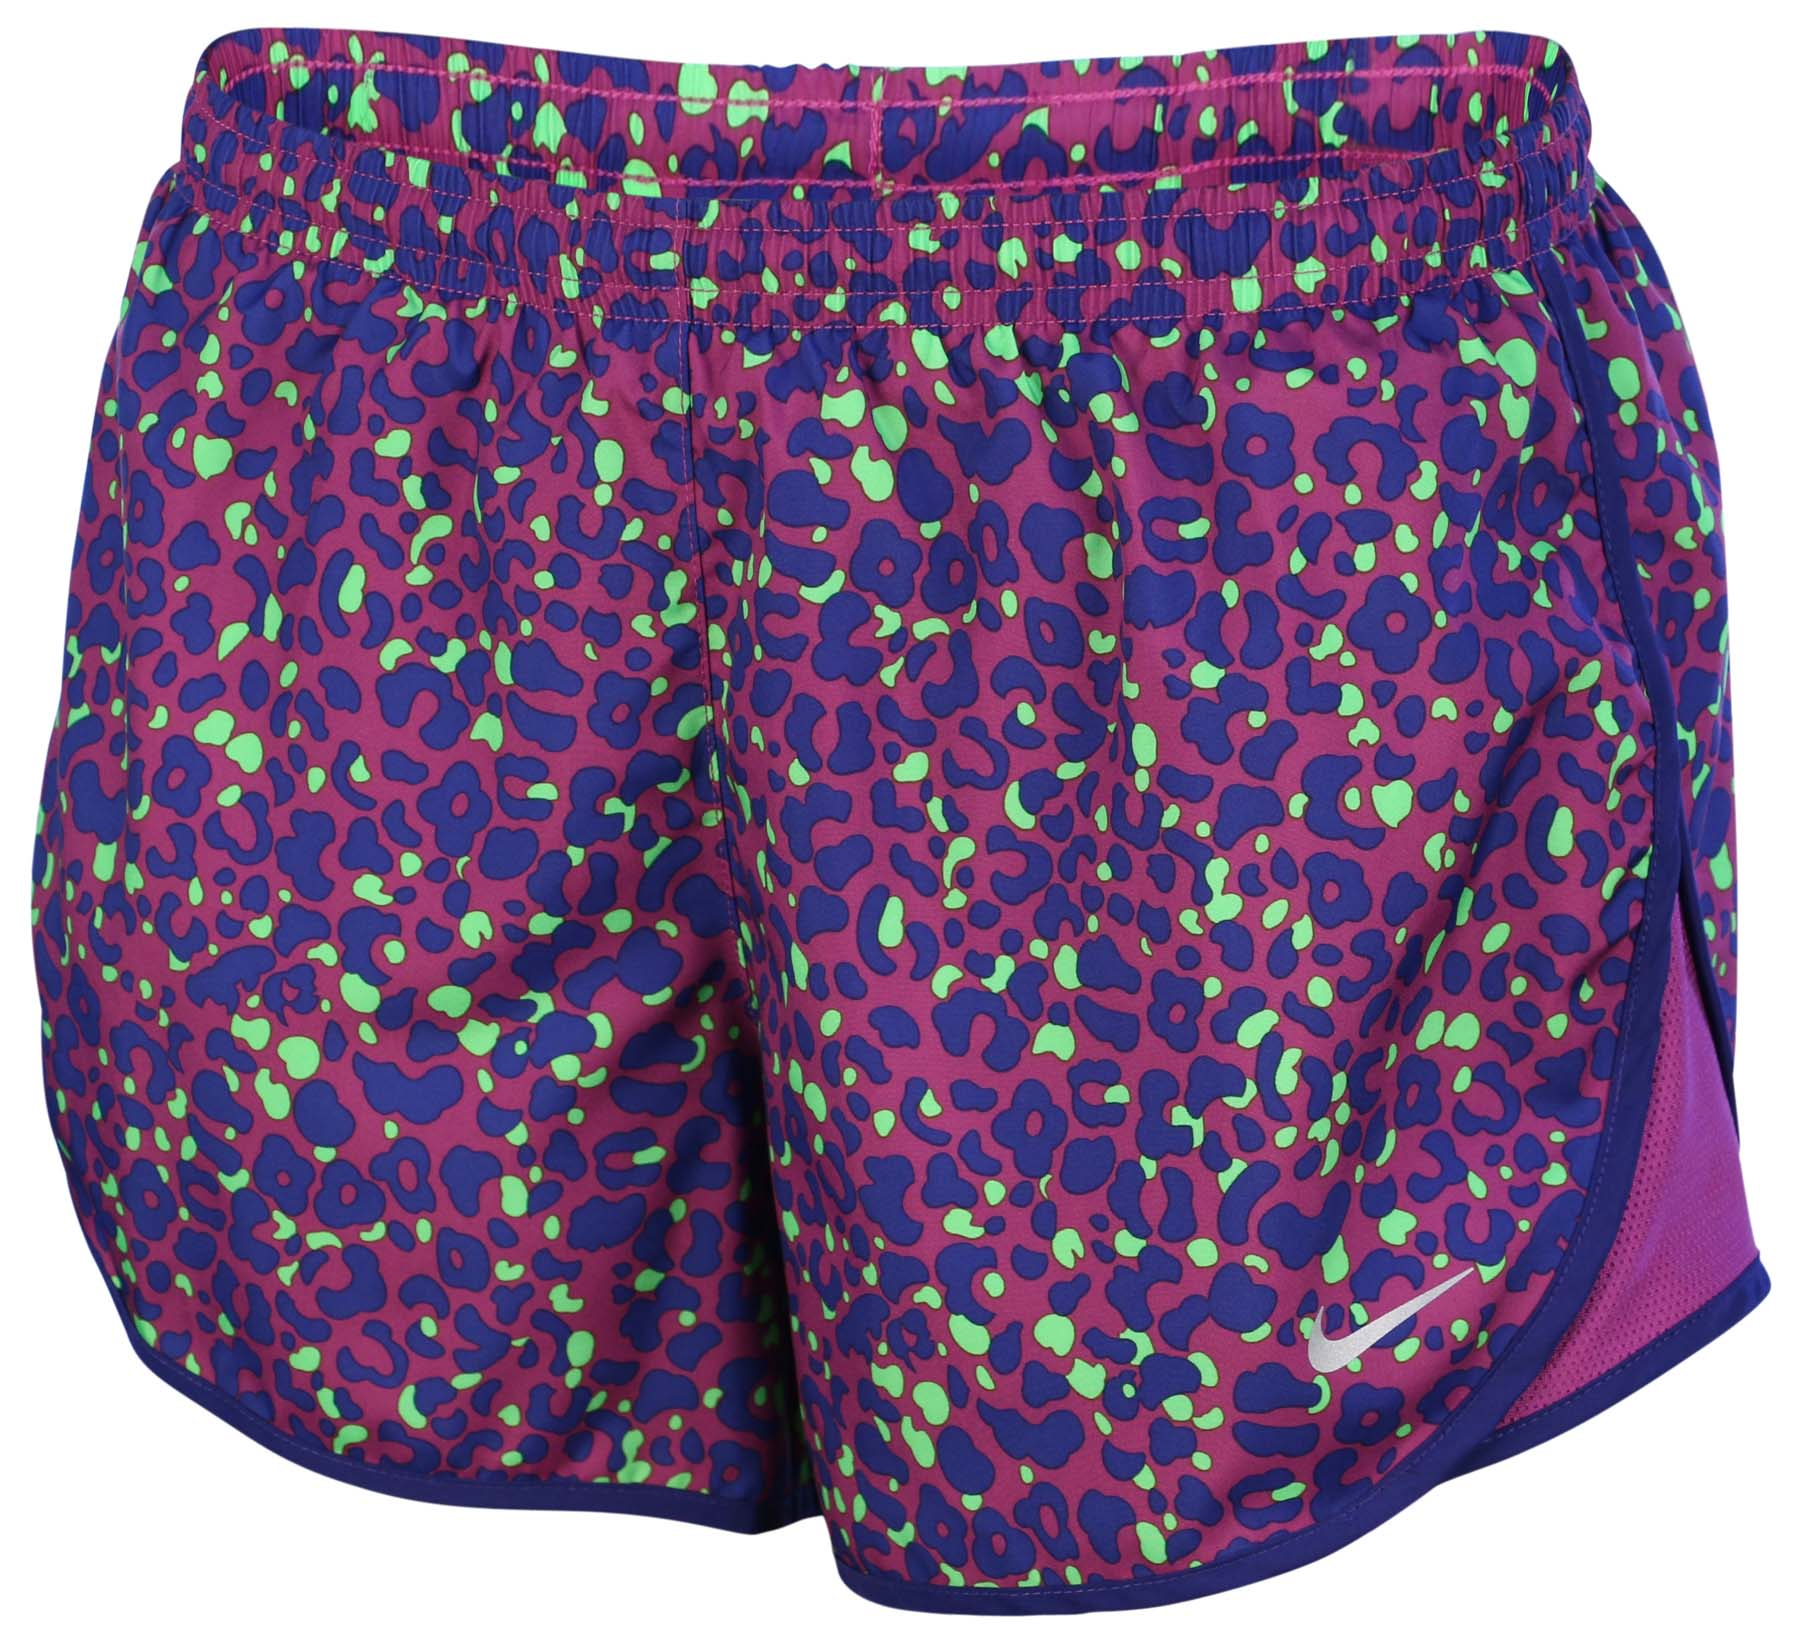 Nike Women's Dri-Fit Lotus Modern Tempo Running Shorts-Purple Dusk/Navy